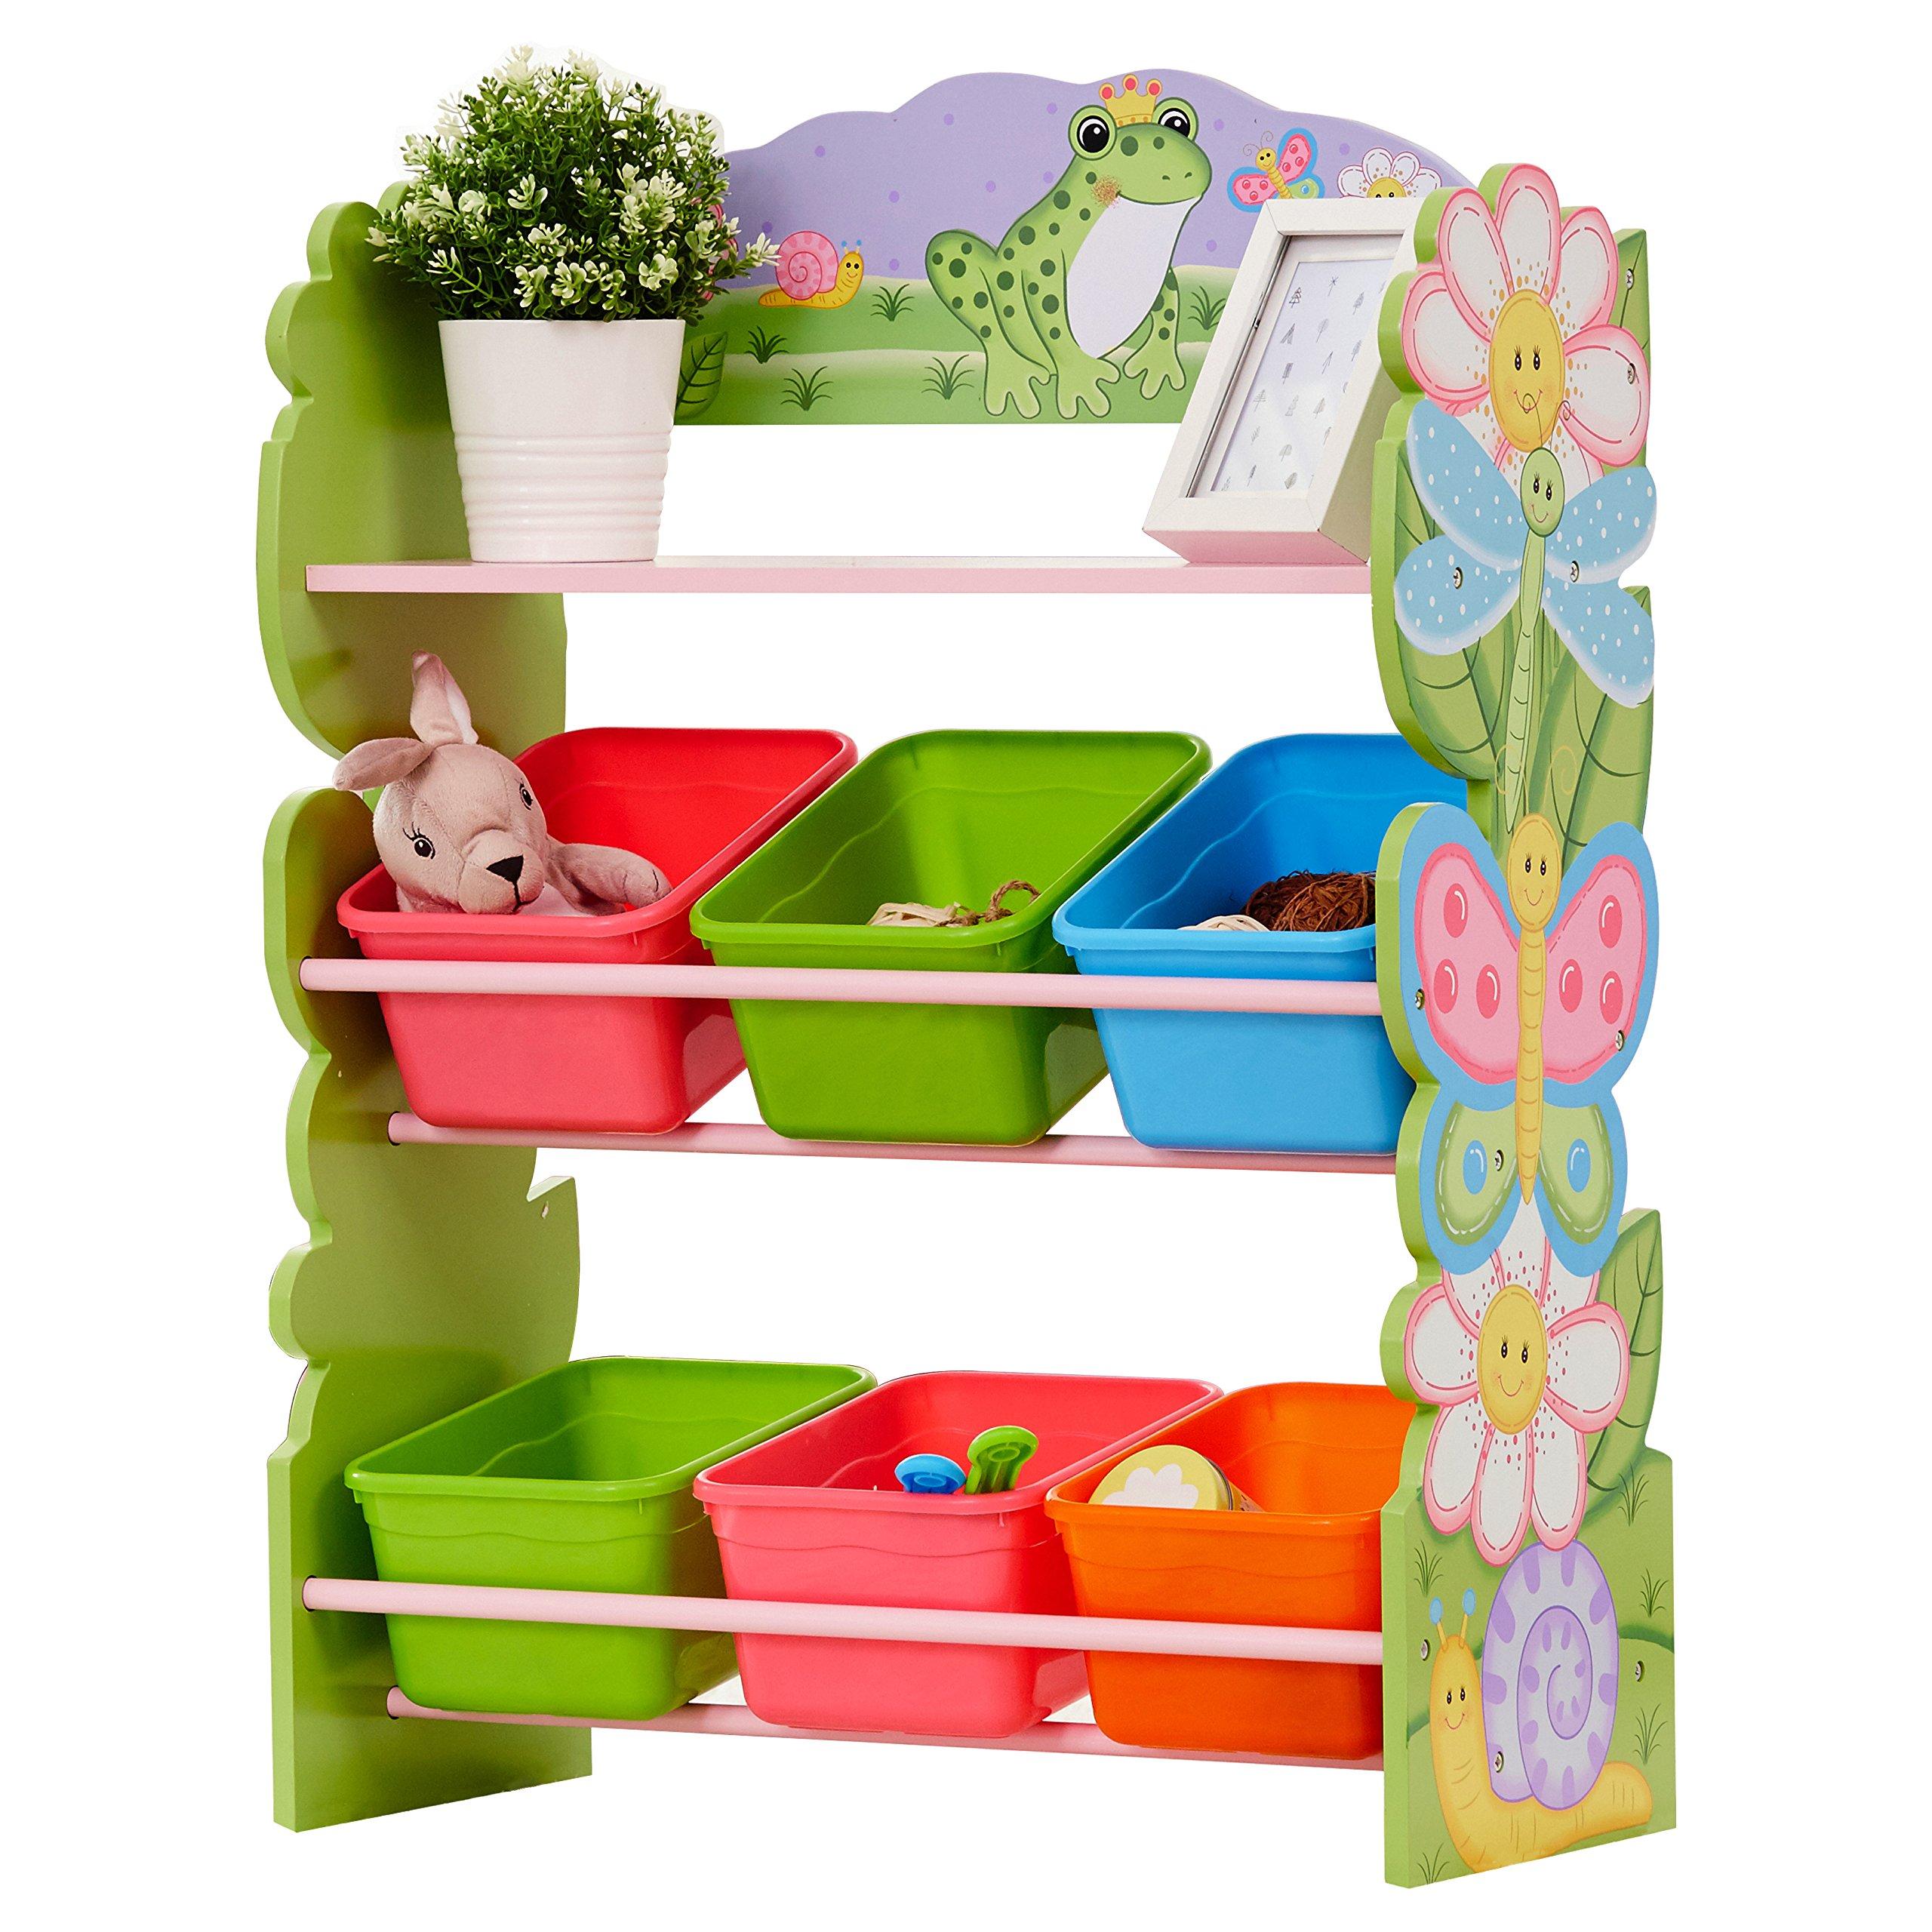 Fantasy Fields - Magic Garden Kids' Toy Organizer with 6 Storage Bins, Pink by Fantasy Fields